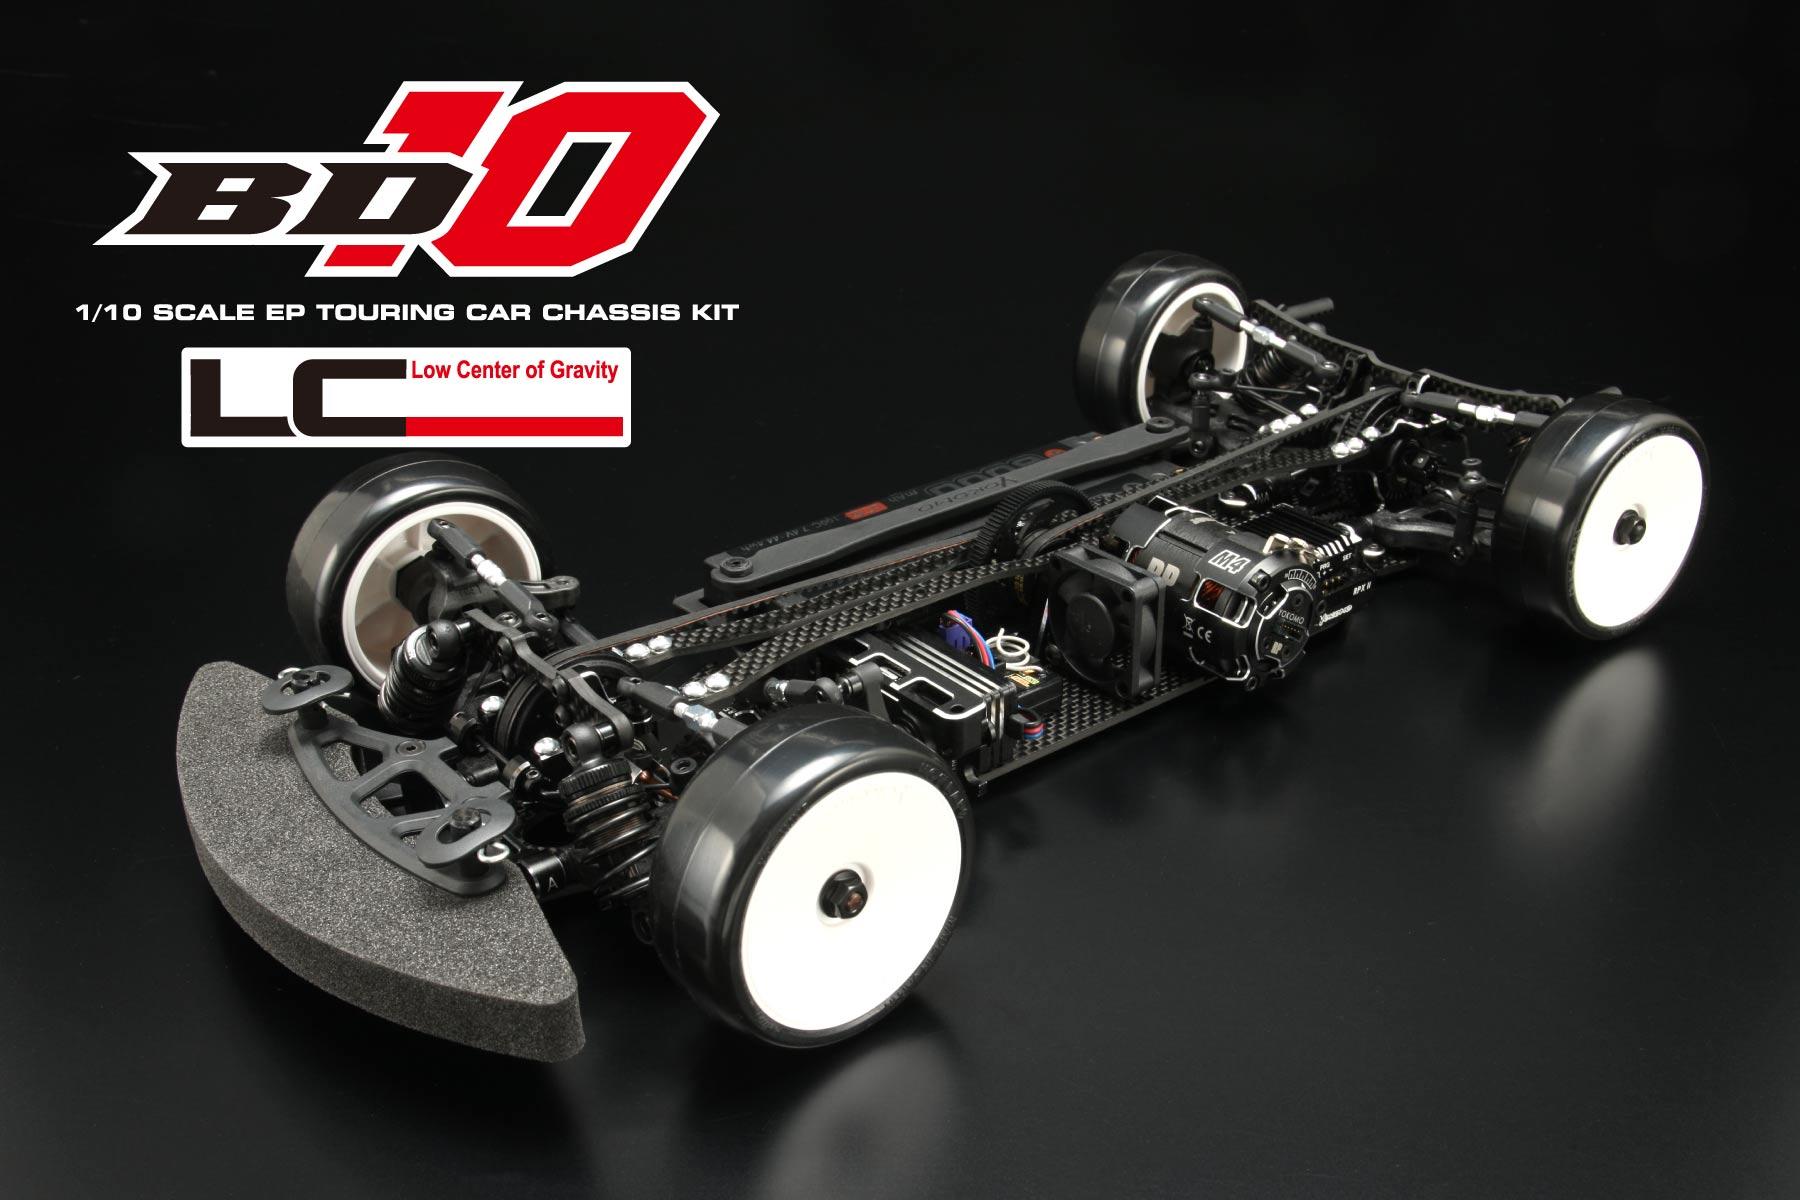 https://store.pro-s-futaba.co.jp/images/mrtc-bd10lc.jpg